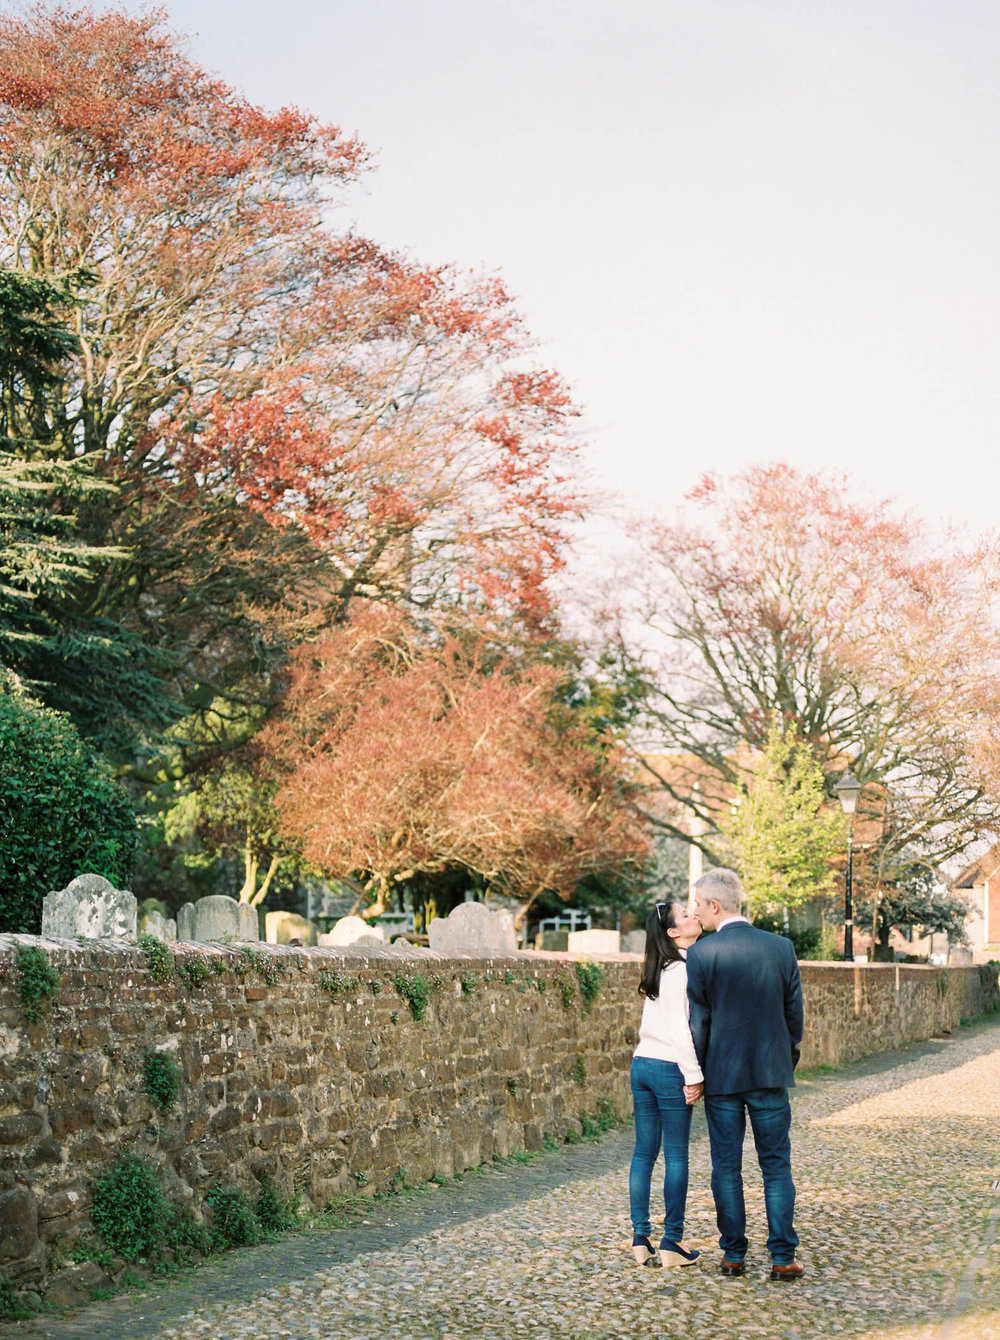 Amy O'Boyle Photography- Destination & UK Fine Art Film Wedding Photographer- Rye Engagement Shoot-6.jpg